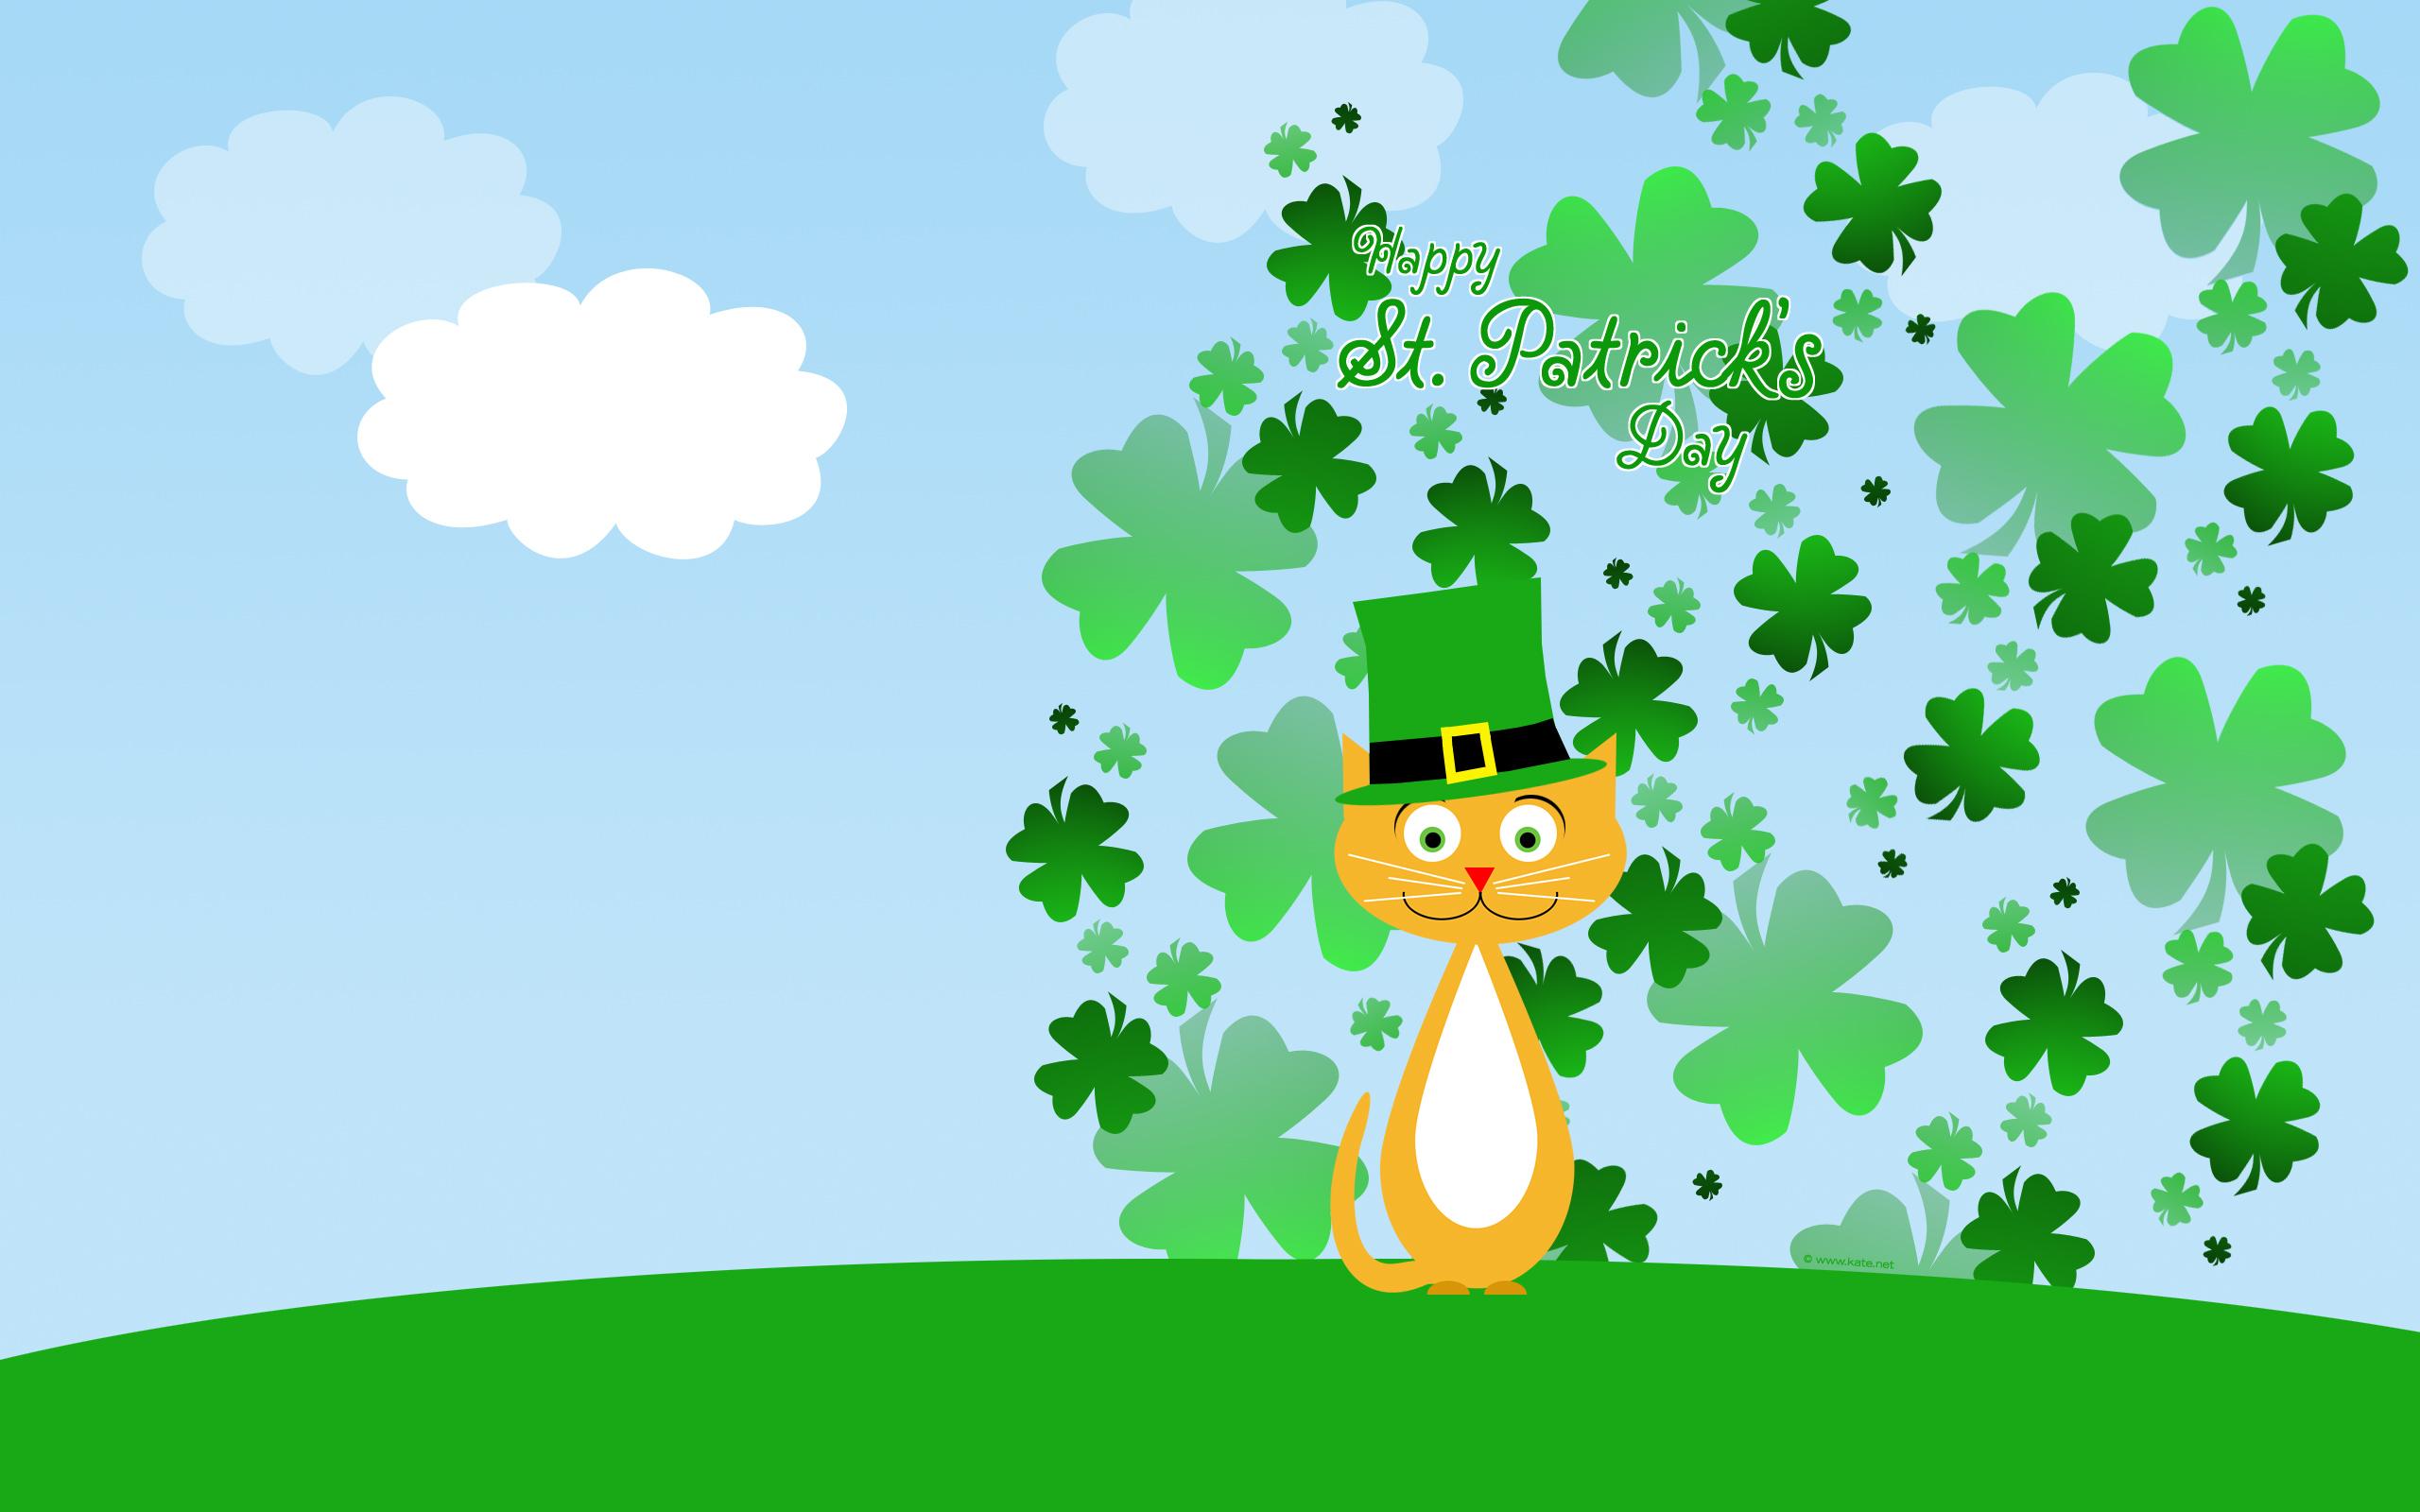 47+] Microsoft St Patrick\'s Day Wallpaper on WallpaperSafari.